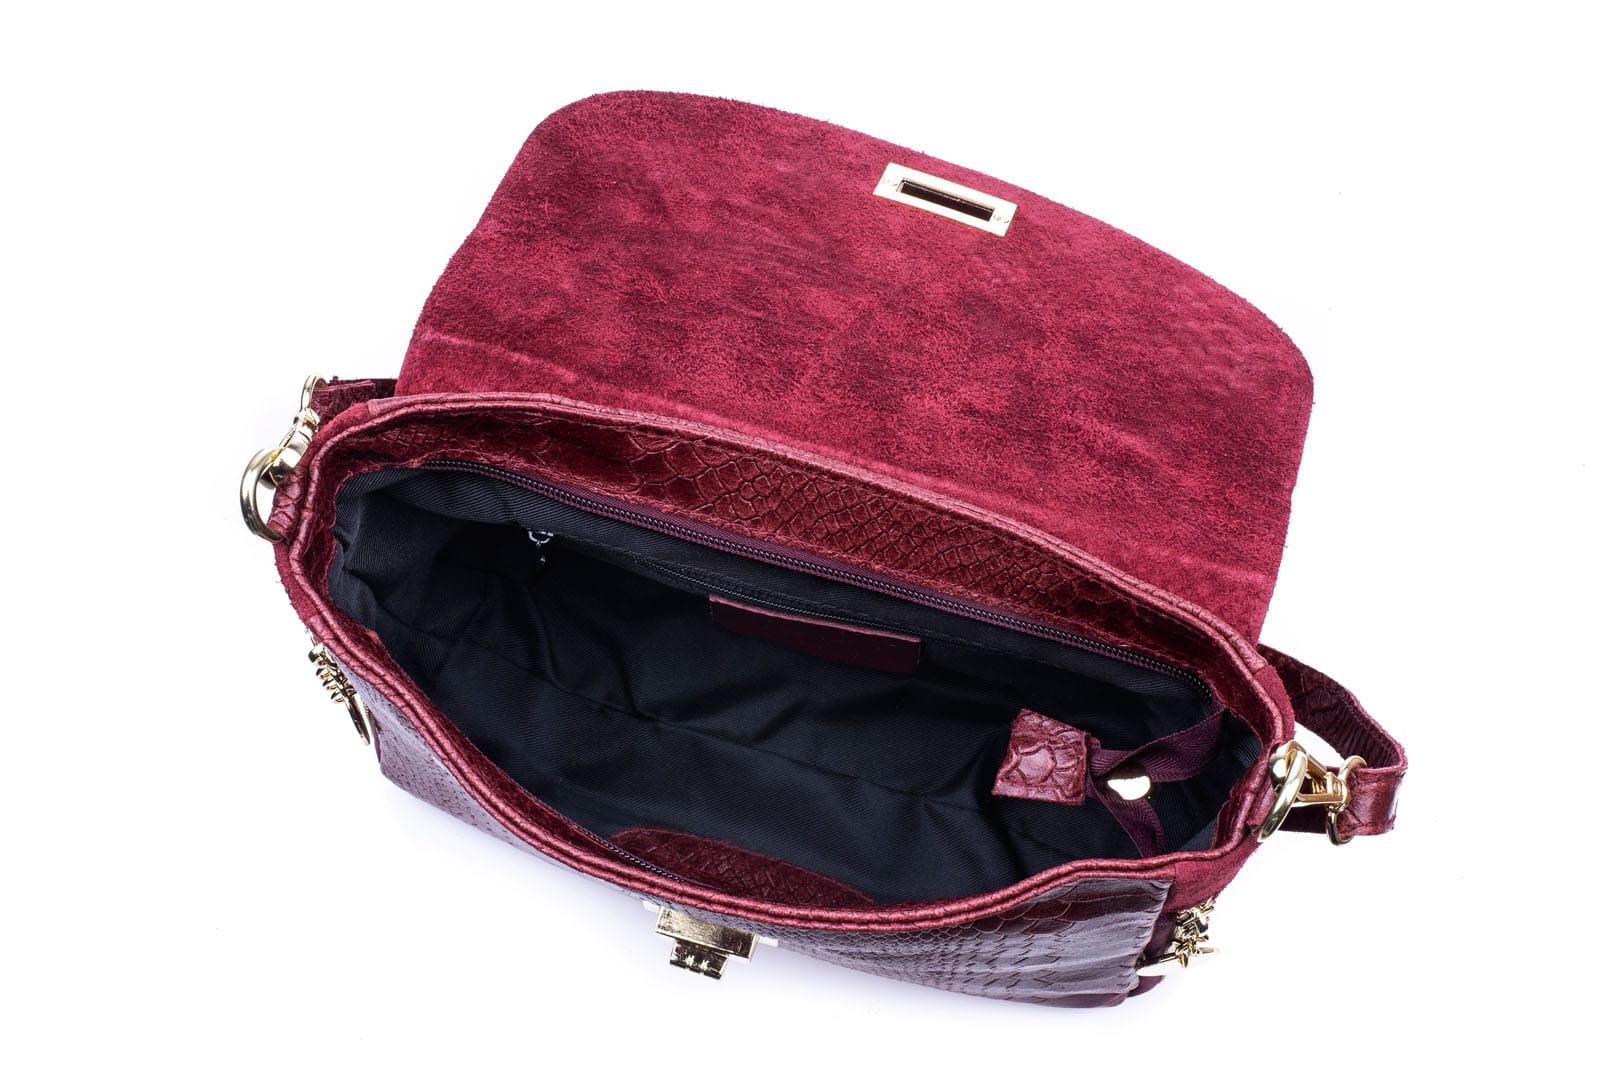 2bd75f2f47669 Torebka Damska Skórzana Vera Pelle Łuski Bordowa Leather Box